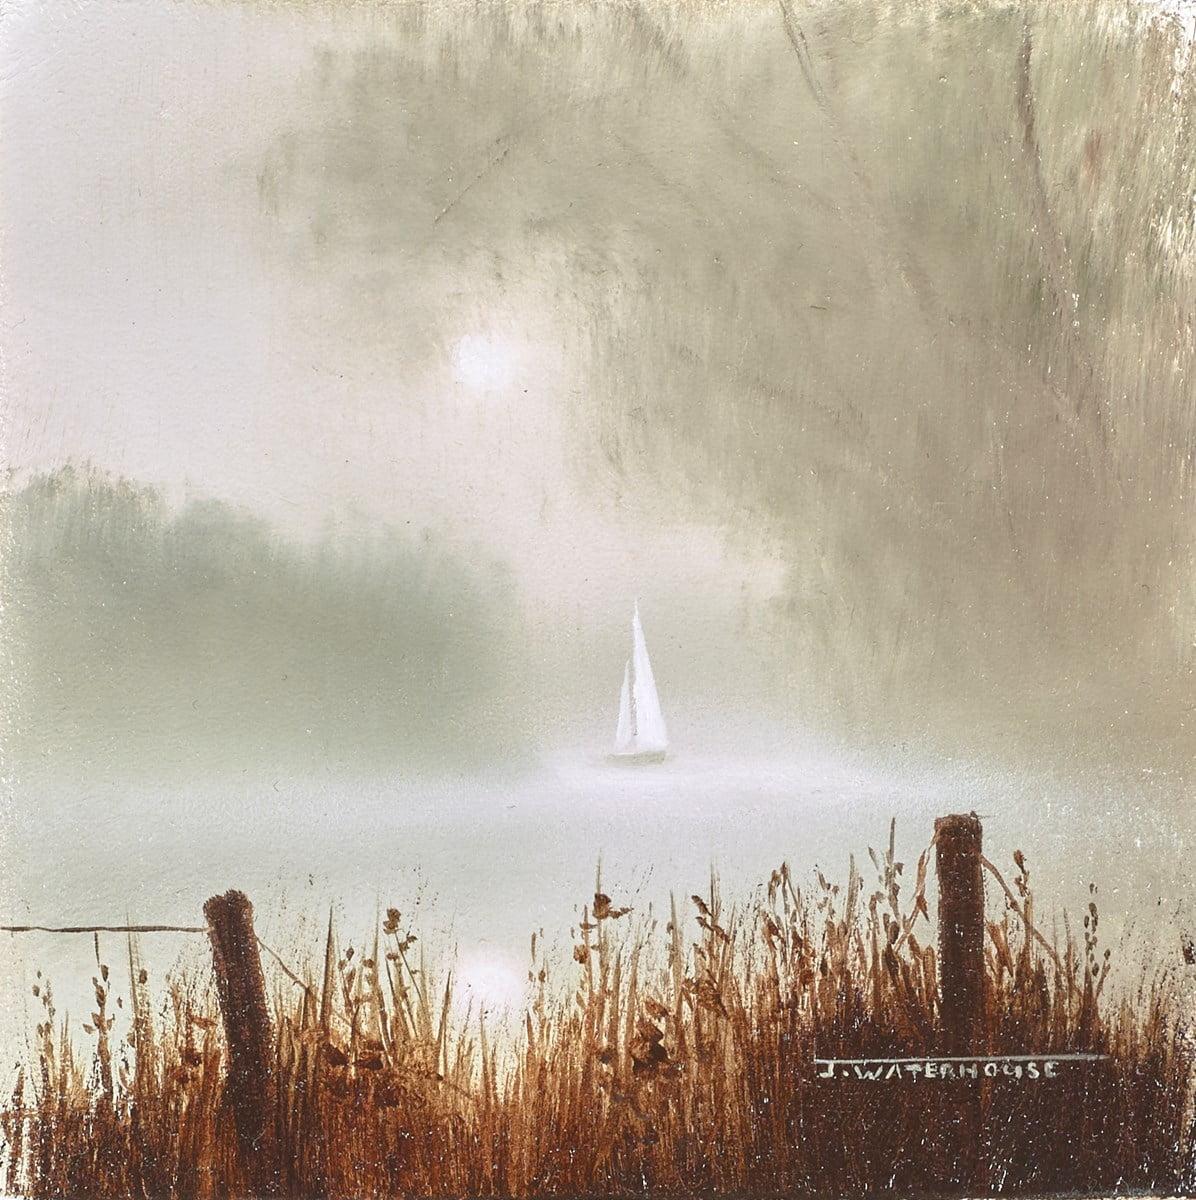 Sailing in Calm Waters ~ John Waterhouse